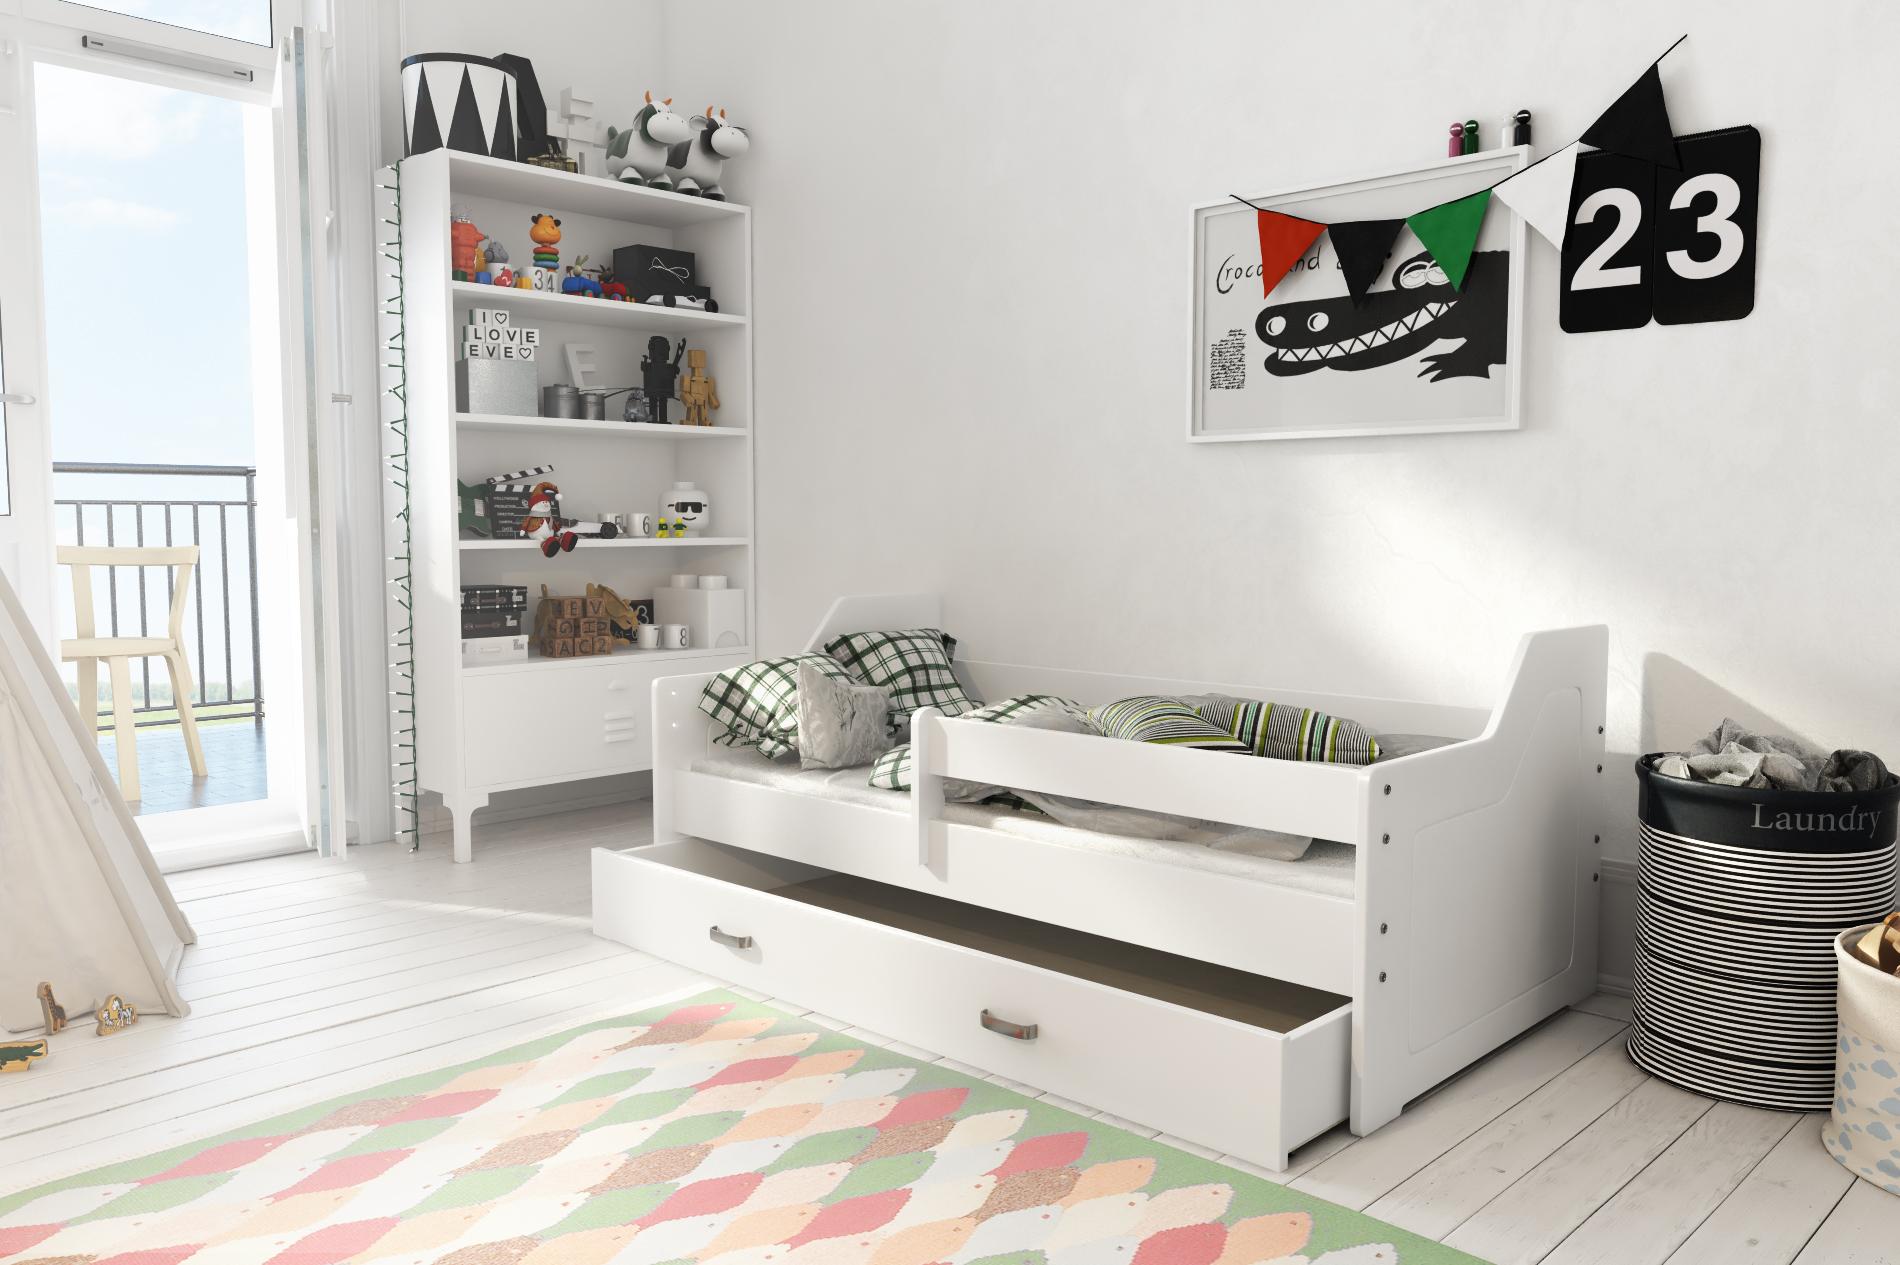 bett jugendbett kinderbett babybett mit schublade und lattenrost 160x80 wei ebay. Black Bedroom Furniture Sets. Home Design Ideas